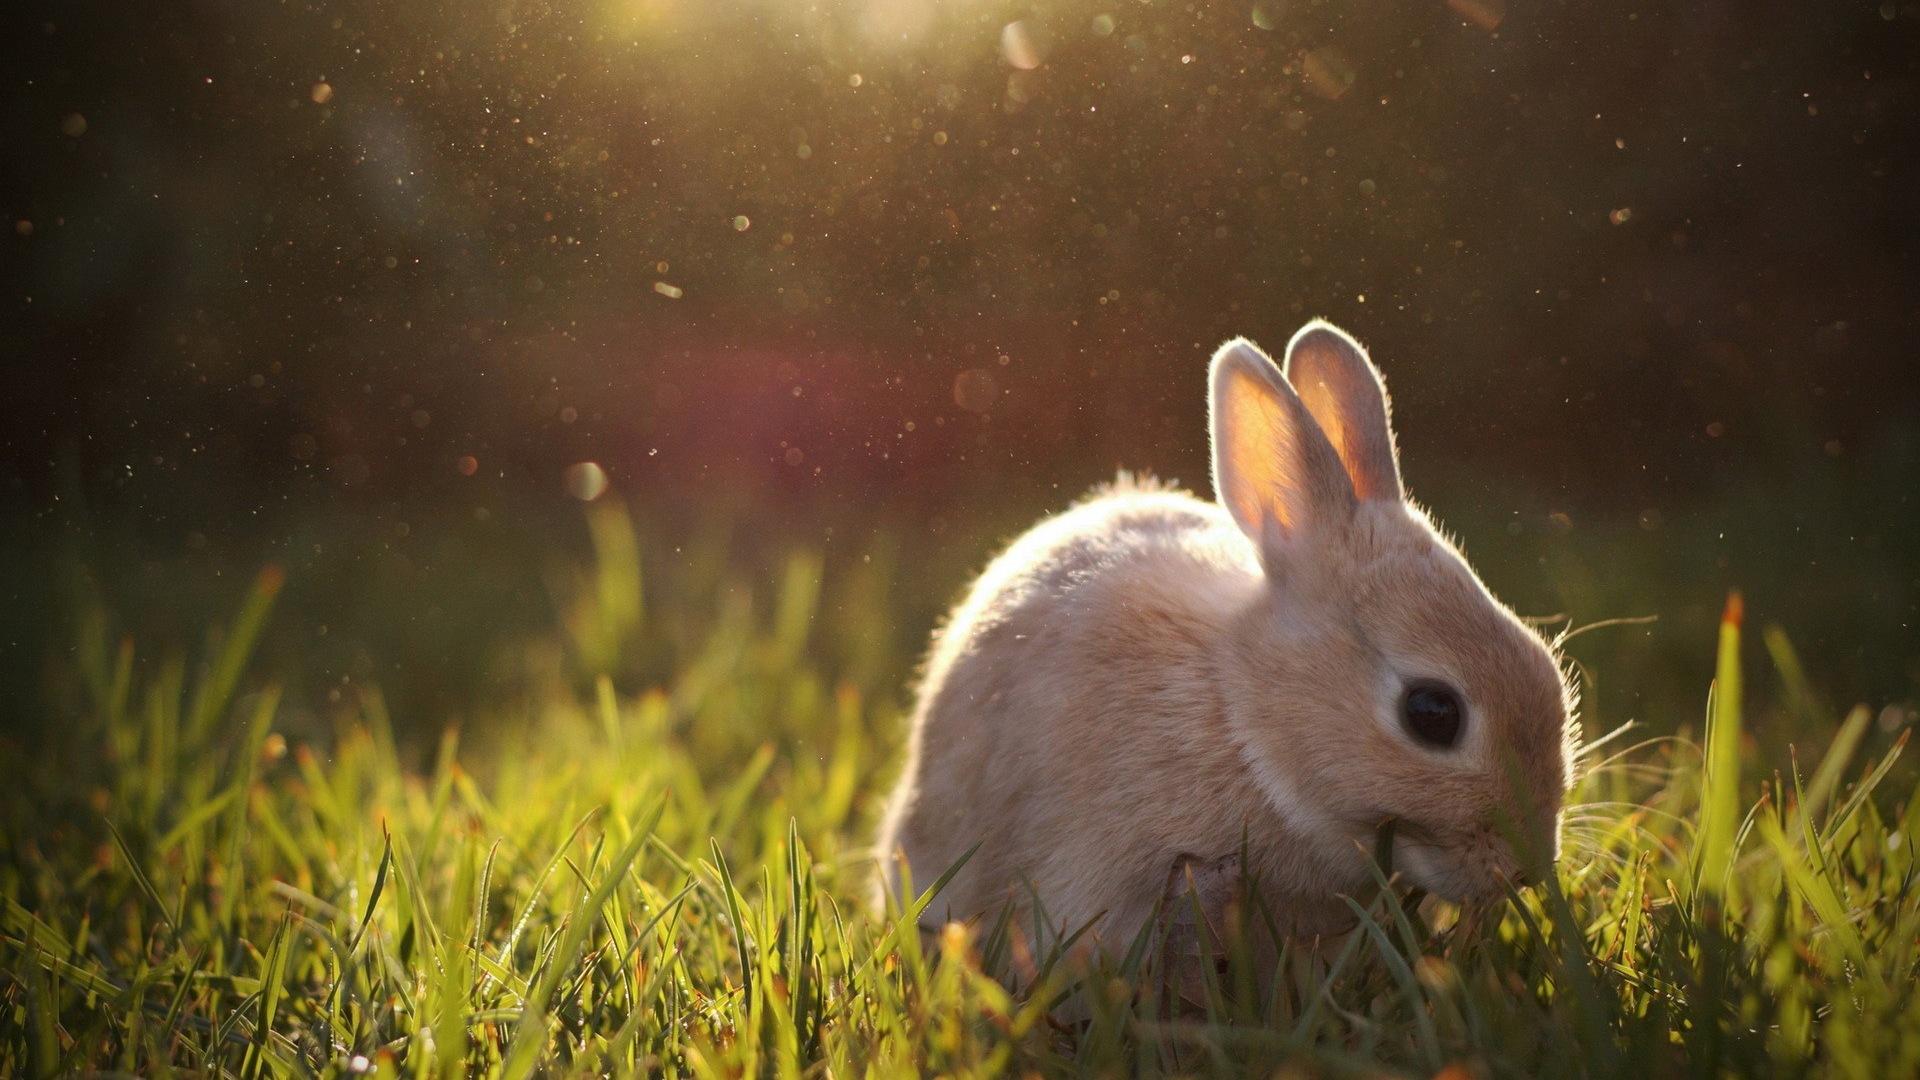 Animaux fourrure mignon fonds d 39 cran lapin hd 10 for Fond ecran animaux hd